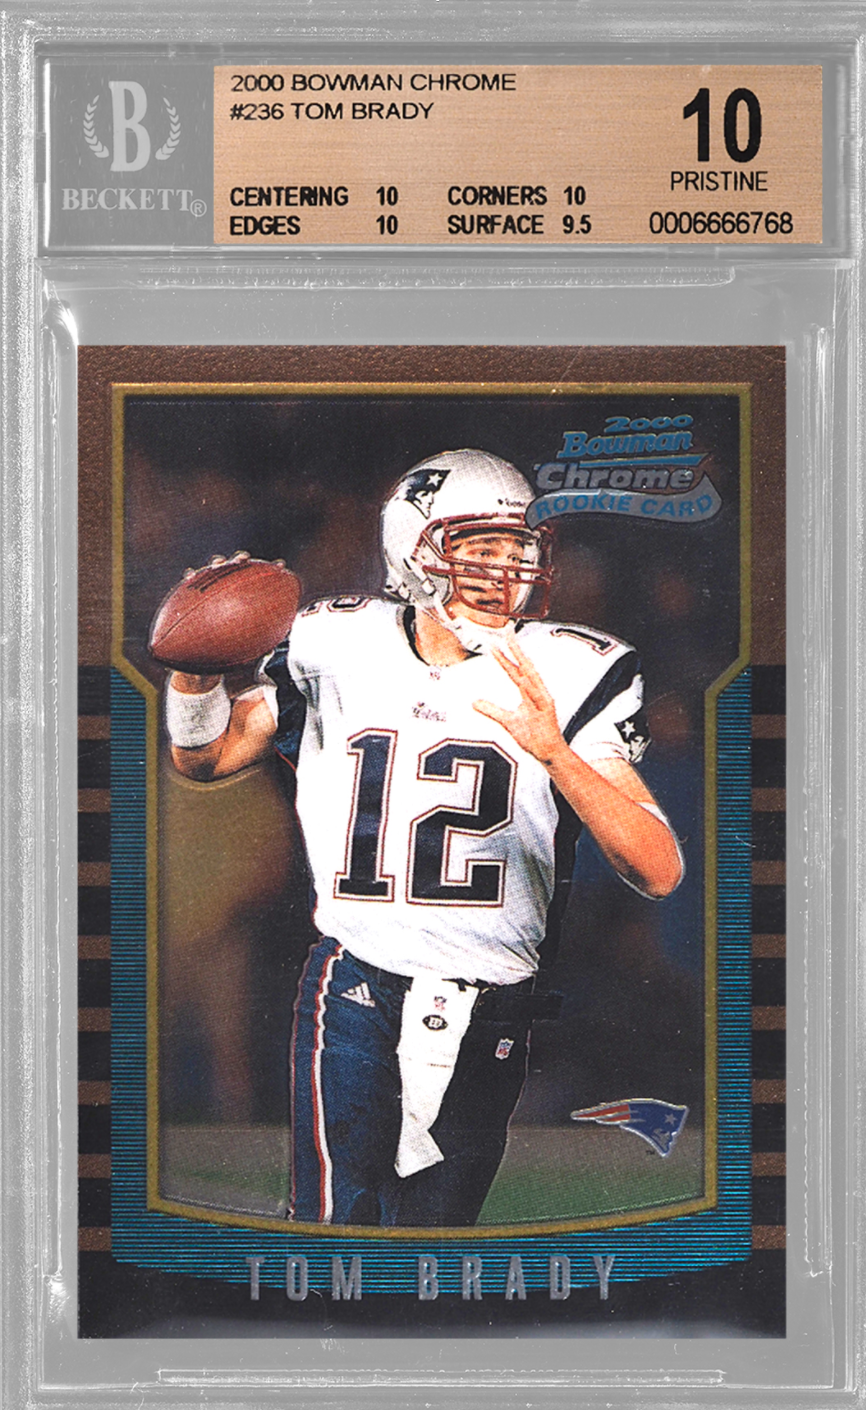 2000 Bowman Chrome Tom Brady Rookie Card (BGS 10)